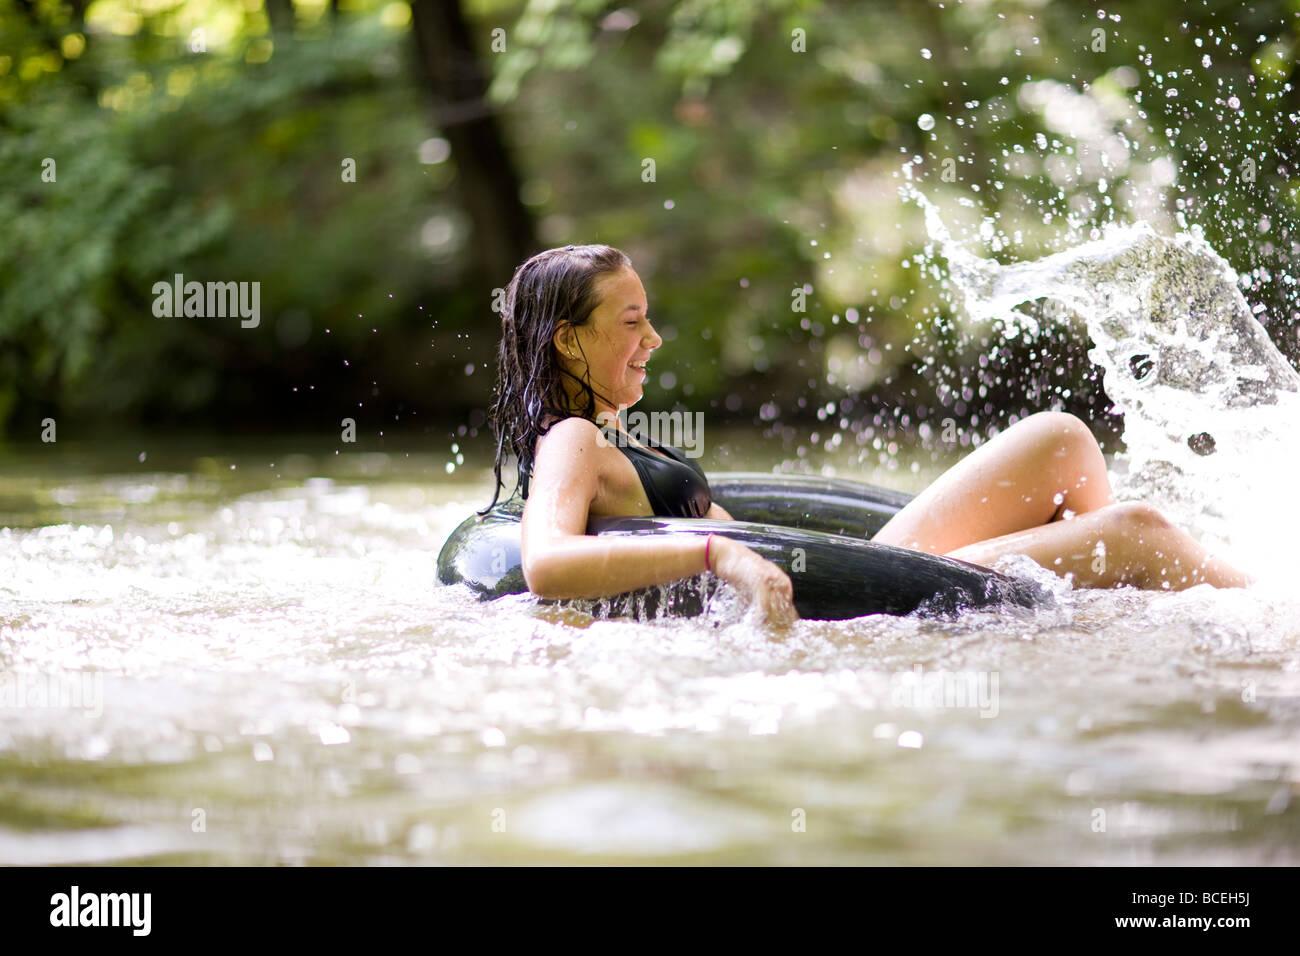 Teenagers splashing water while sitting in innertubes - Stock Image